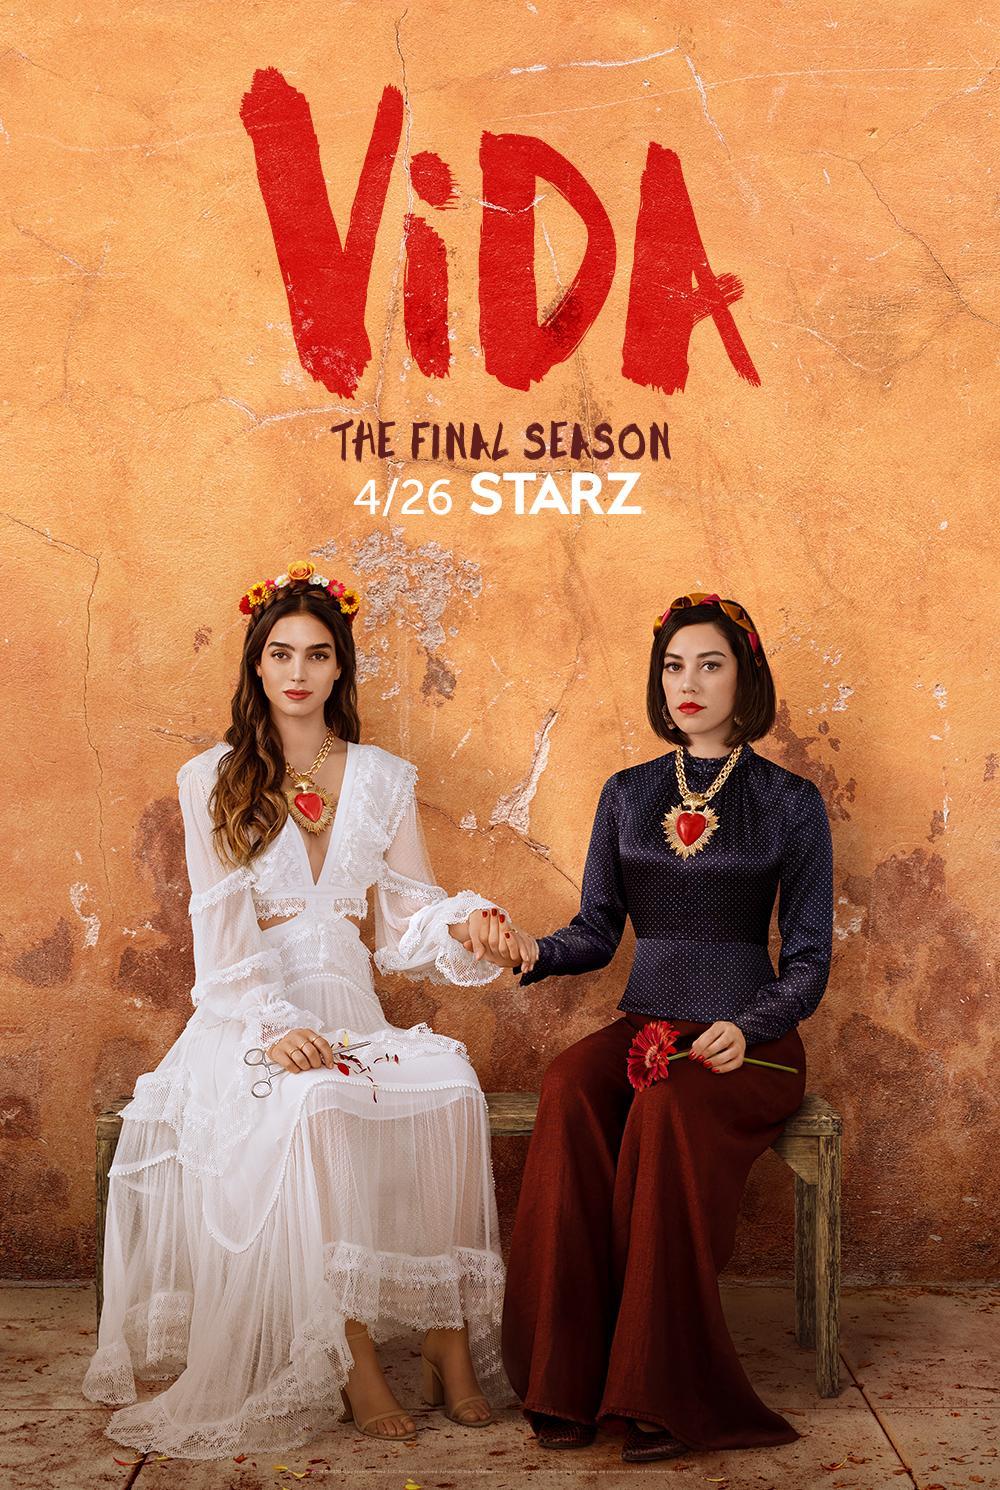 Vida - New Series on Starz